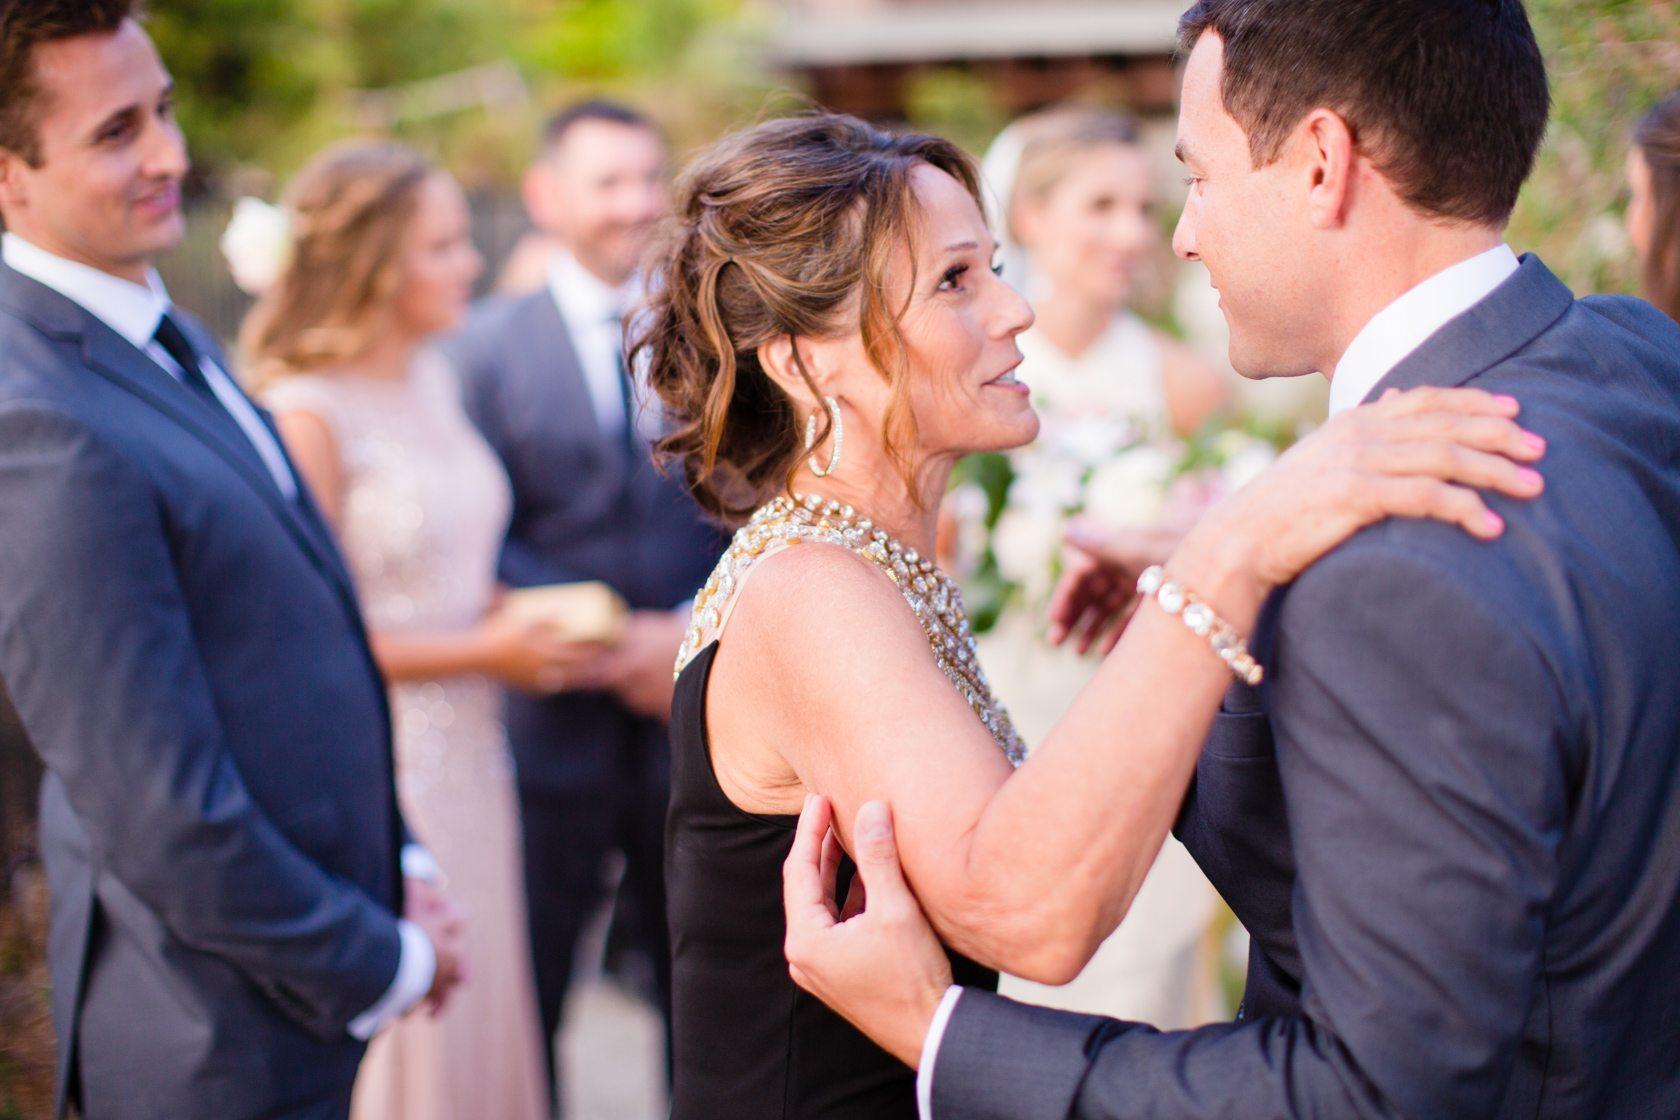 The_Lodge_at_Torrey_Pines_Wedding_068.jpg